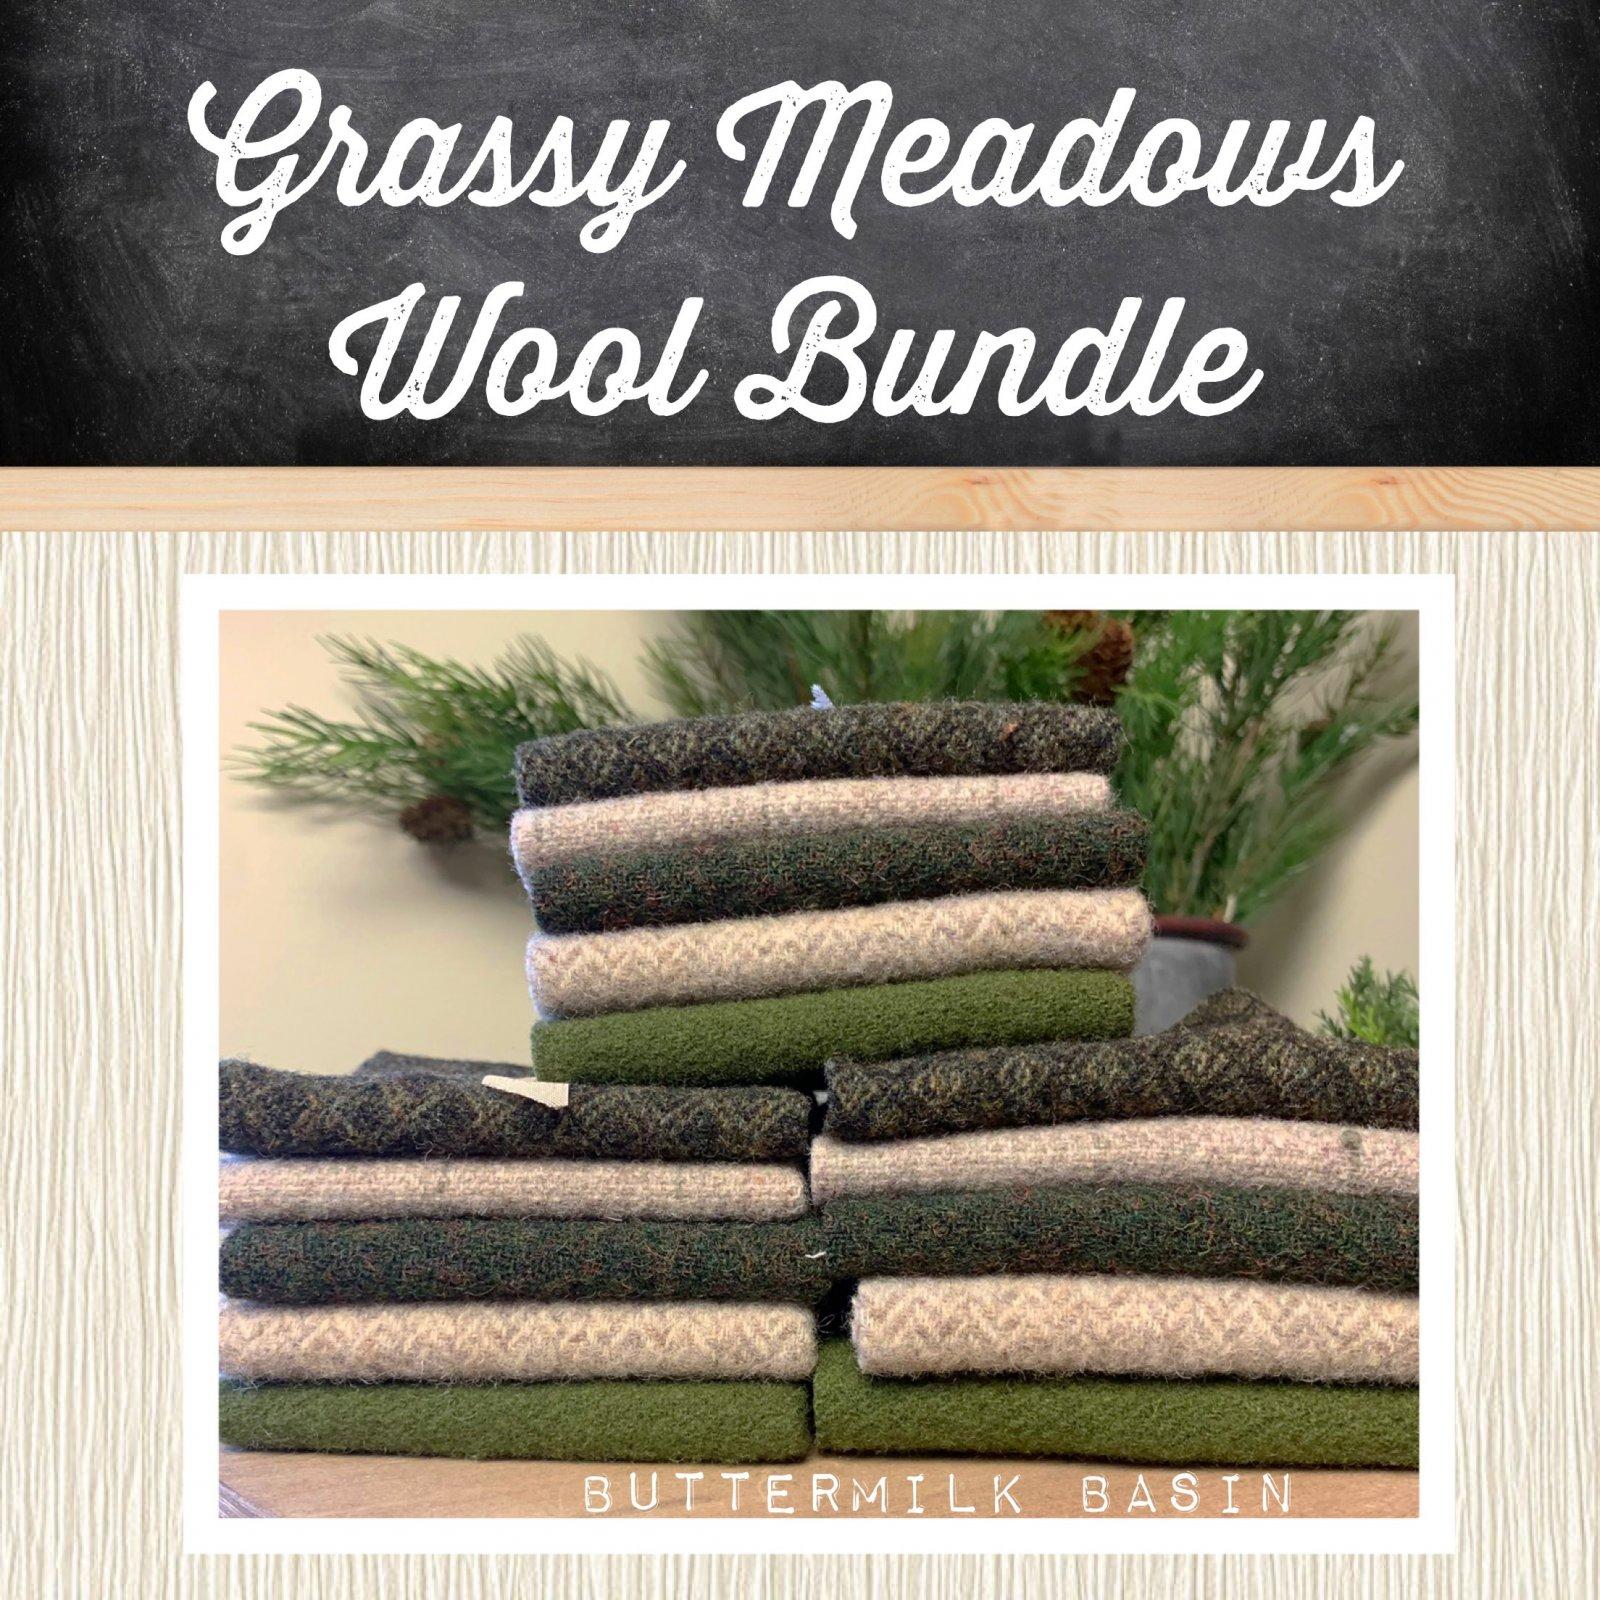 Grassy Meadows Wool Bundle